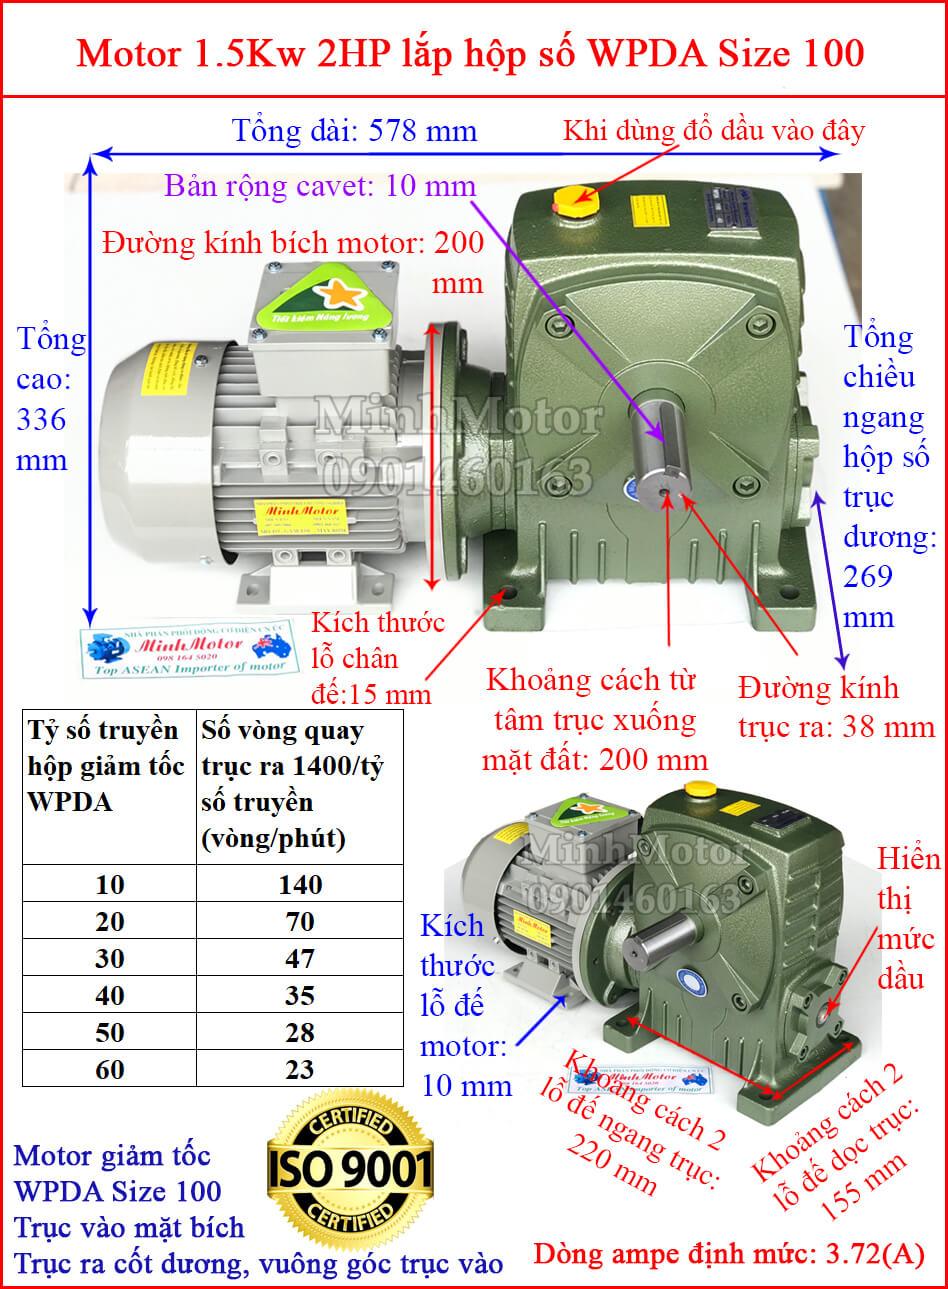 Hộp số WPDA size 100 liền motor